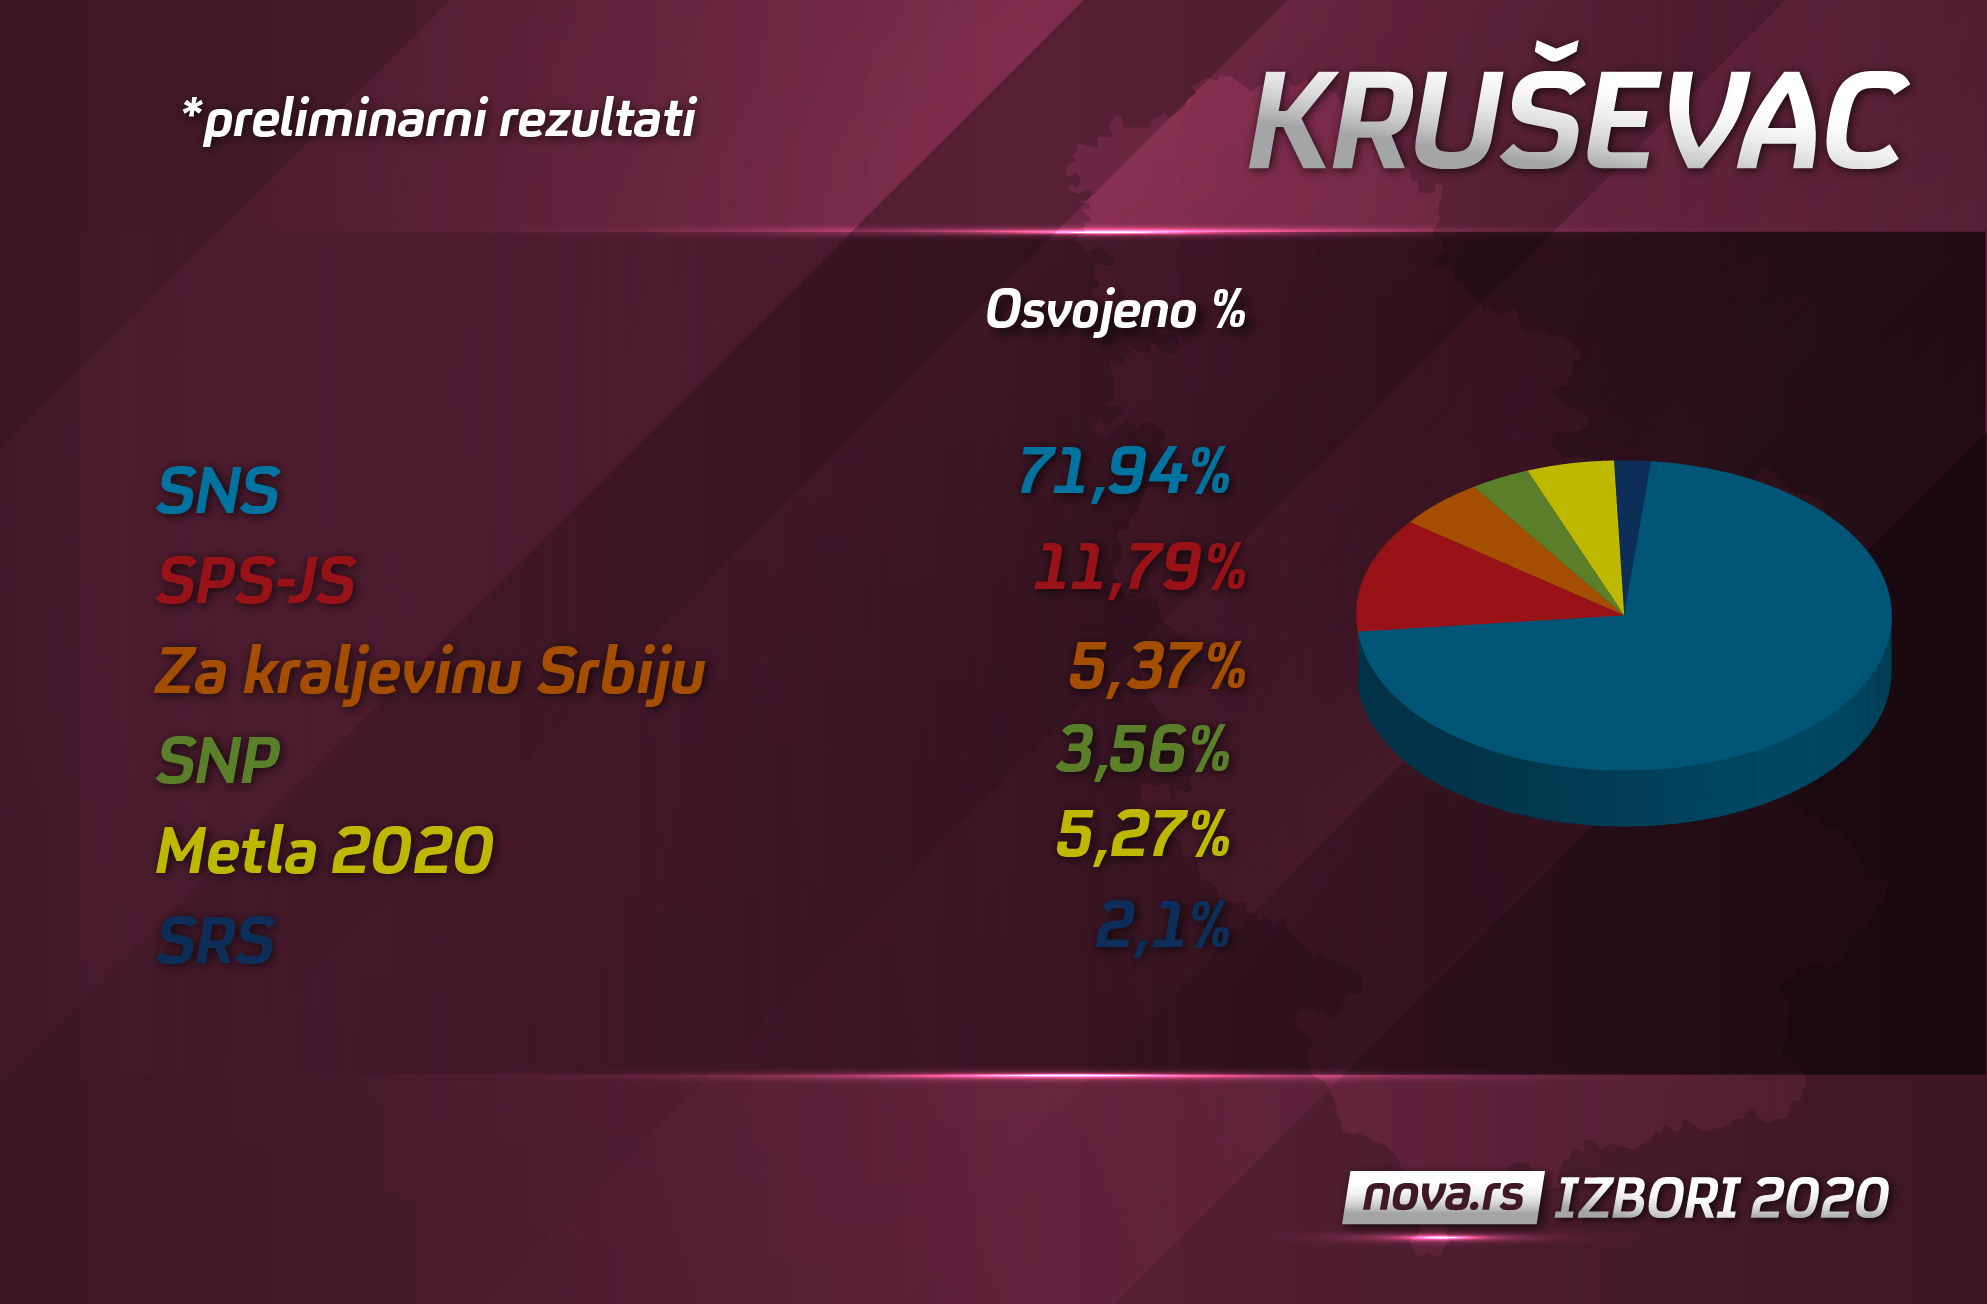 krusevac izborni rezultati